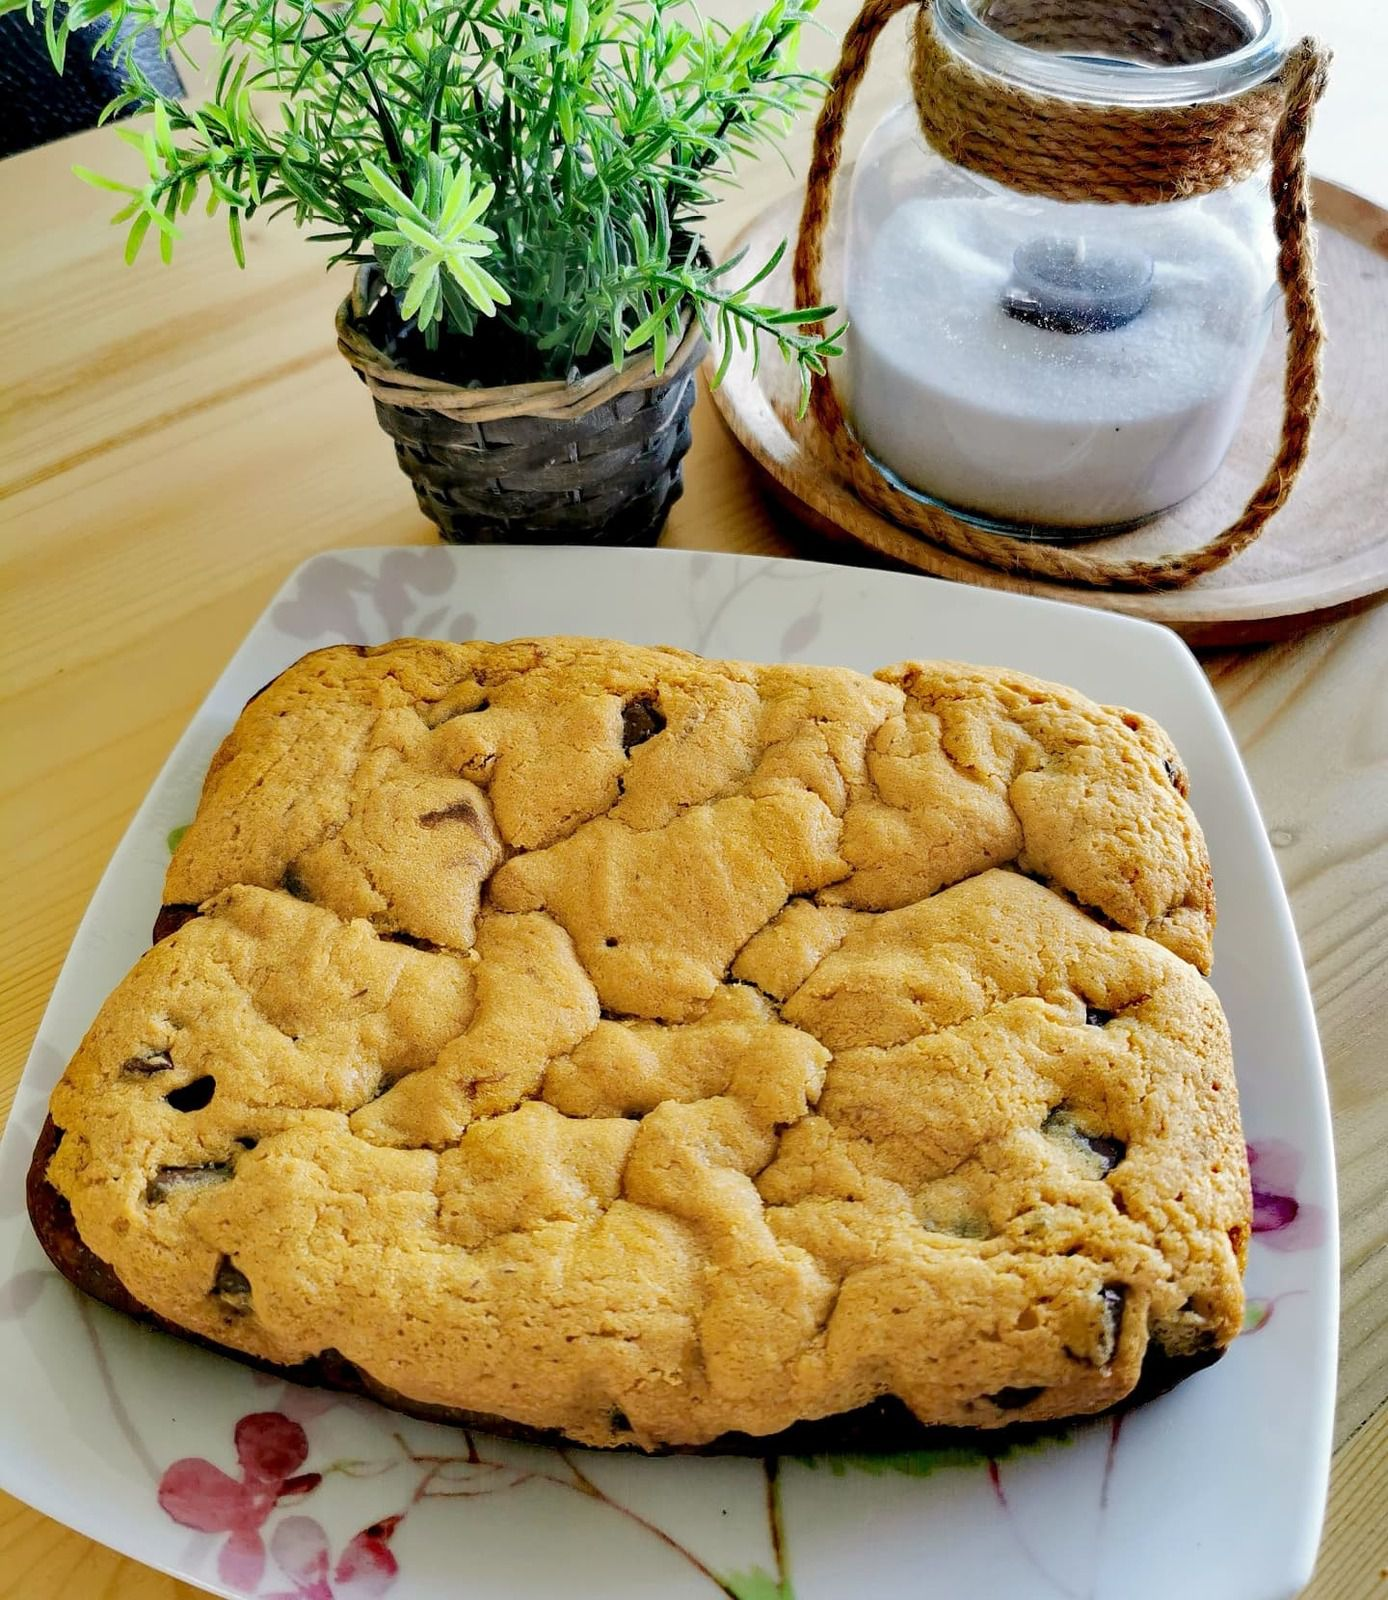 #browniecookie #recettesimple #gâteauchocolat